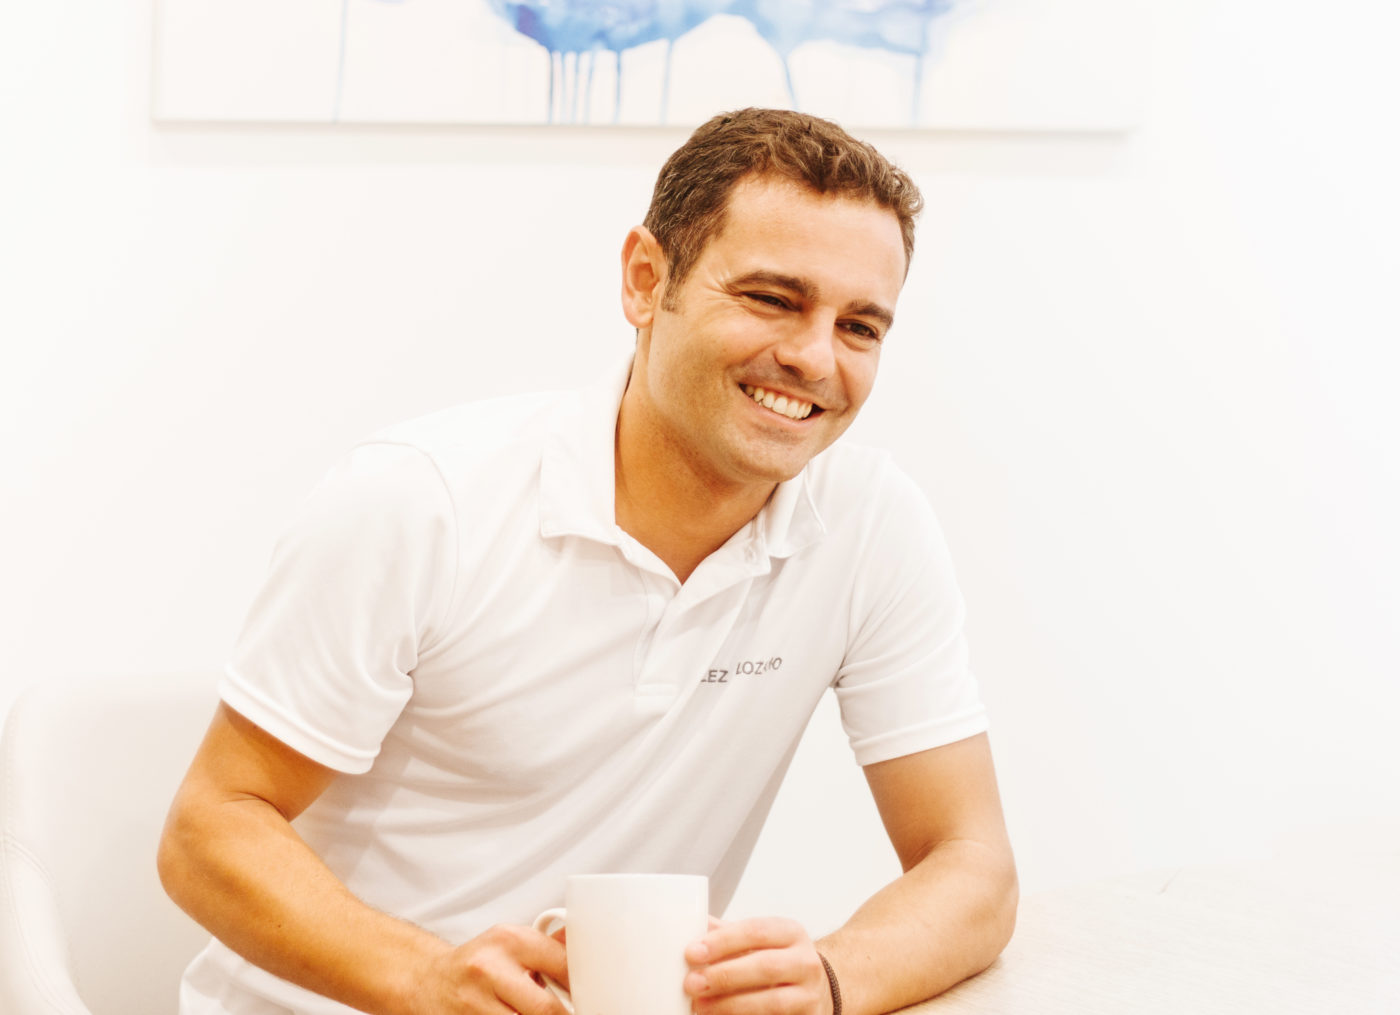 Fernando Vélez sonriendo